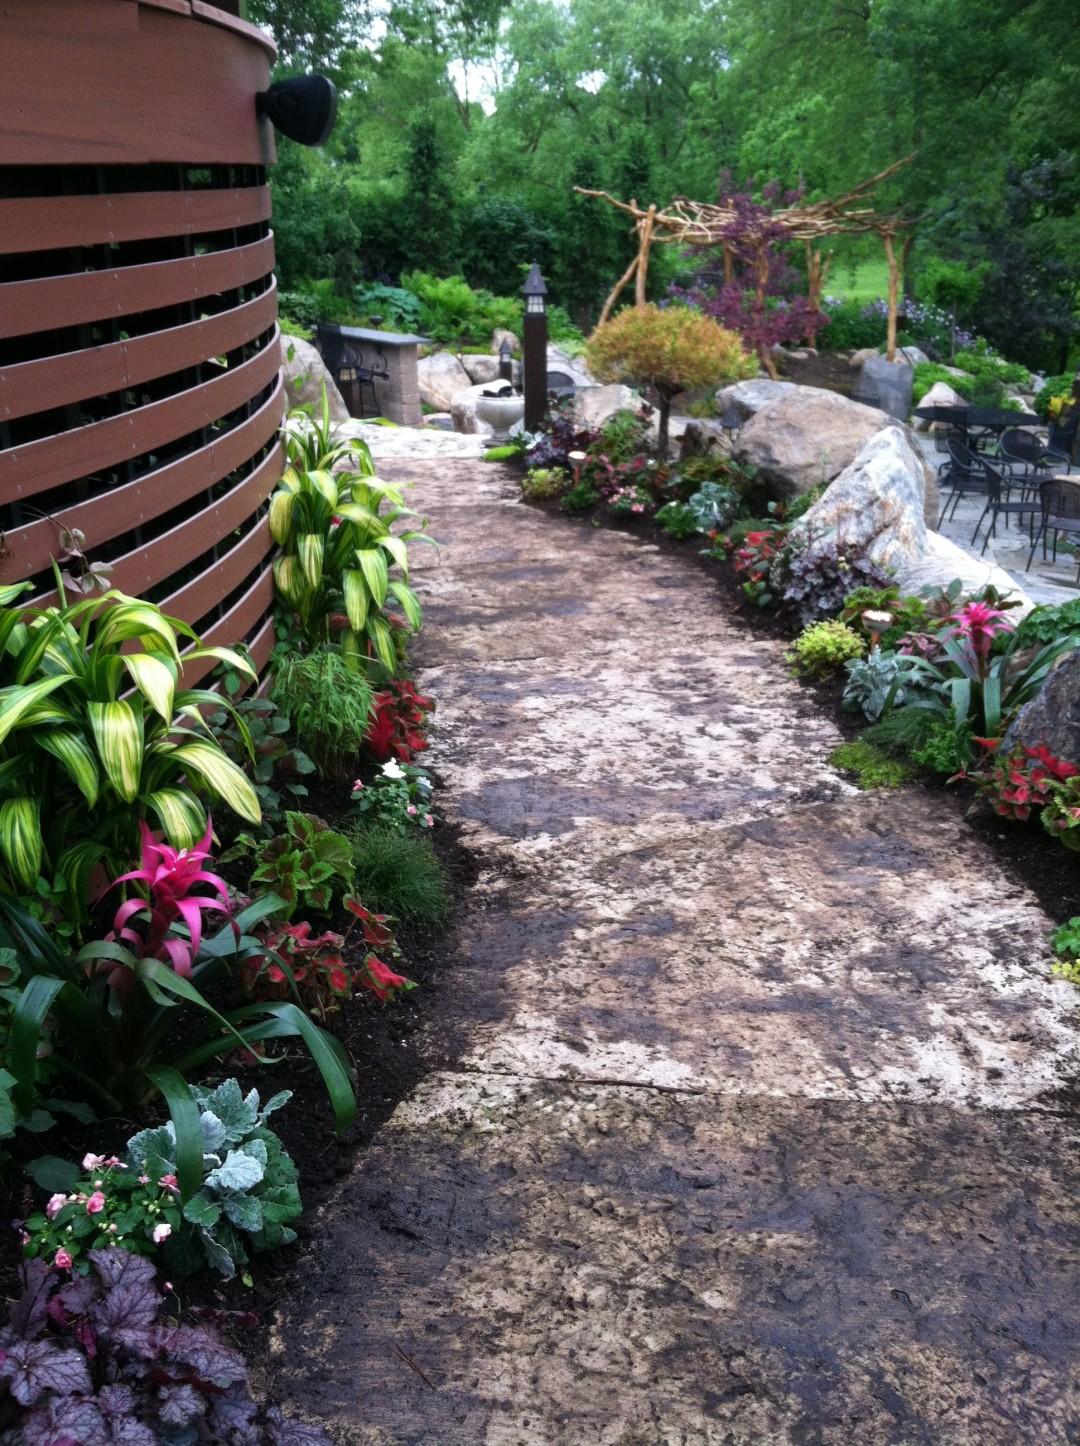 Tropical annual planting, summer 2015